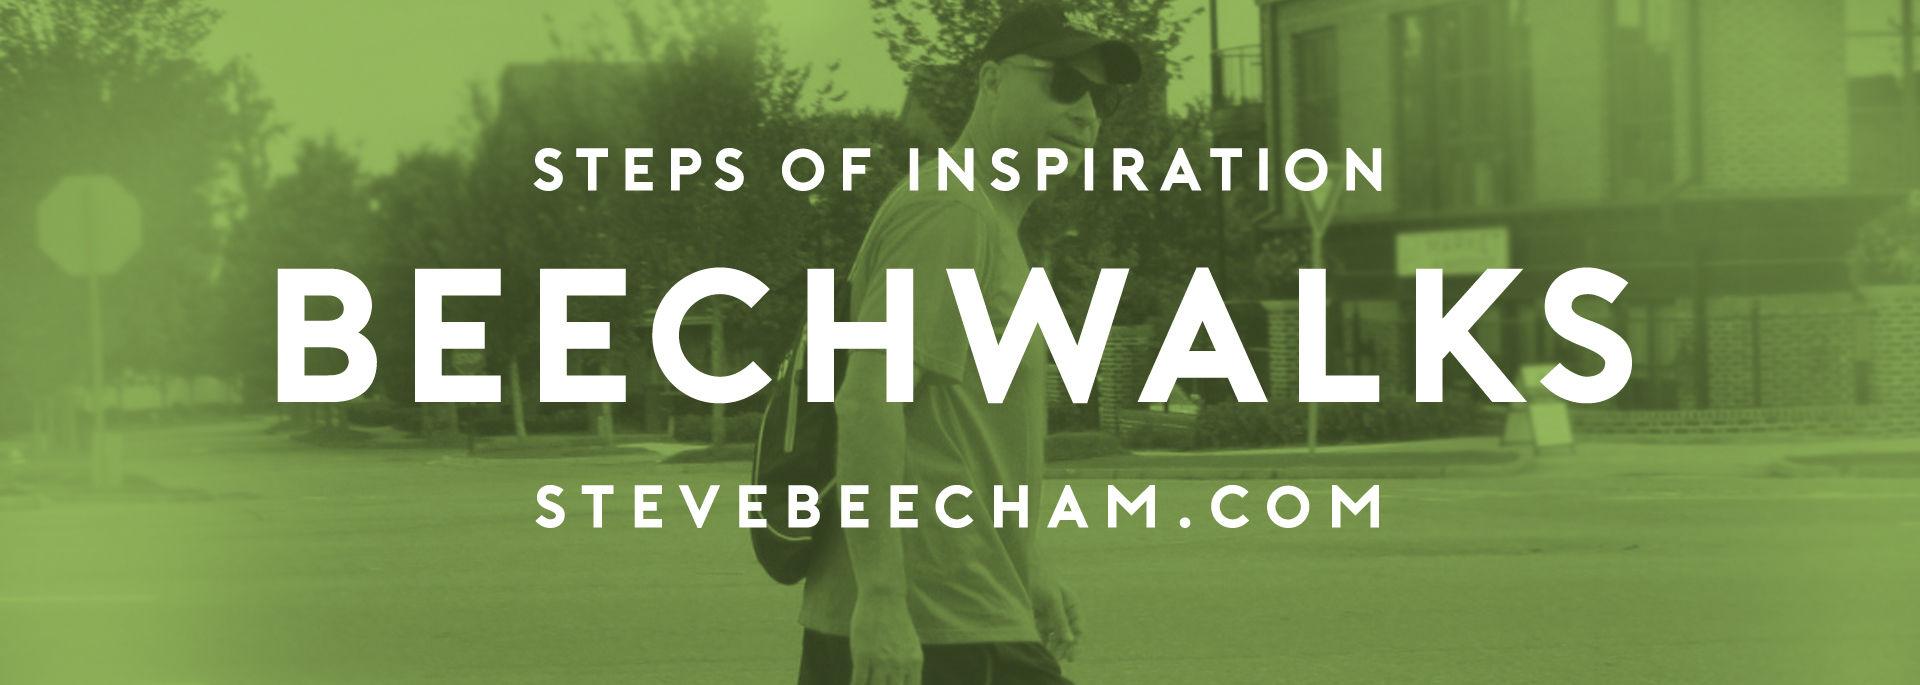 Beechwalks